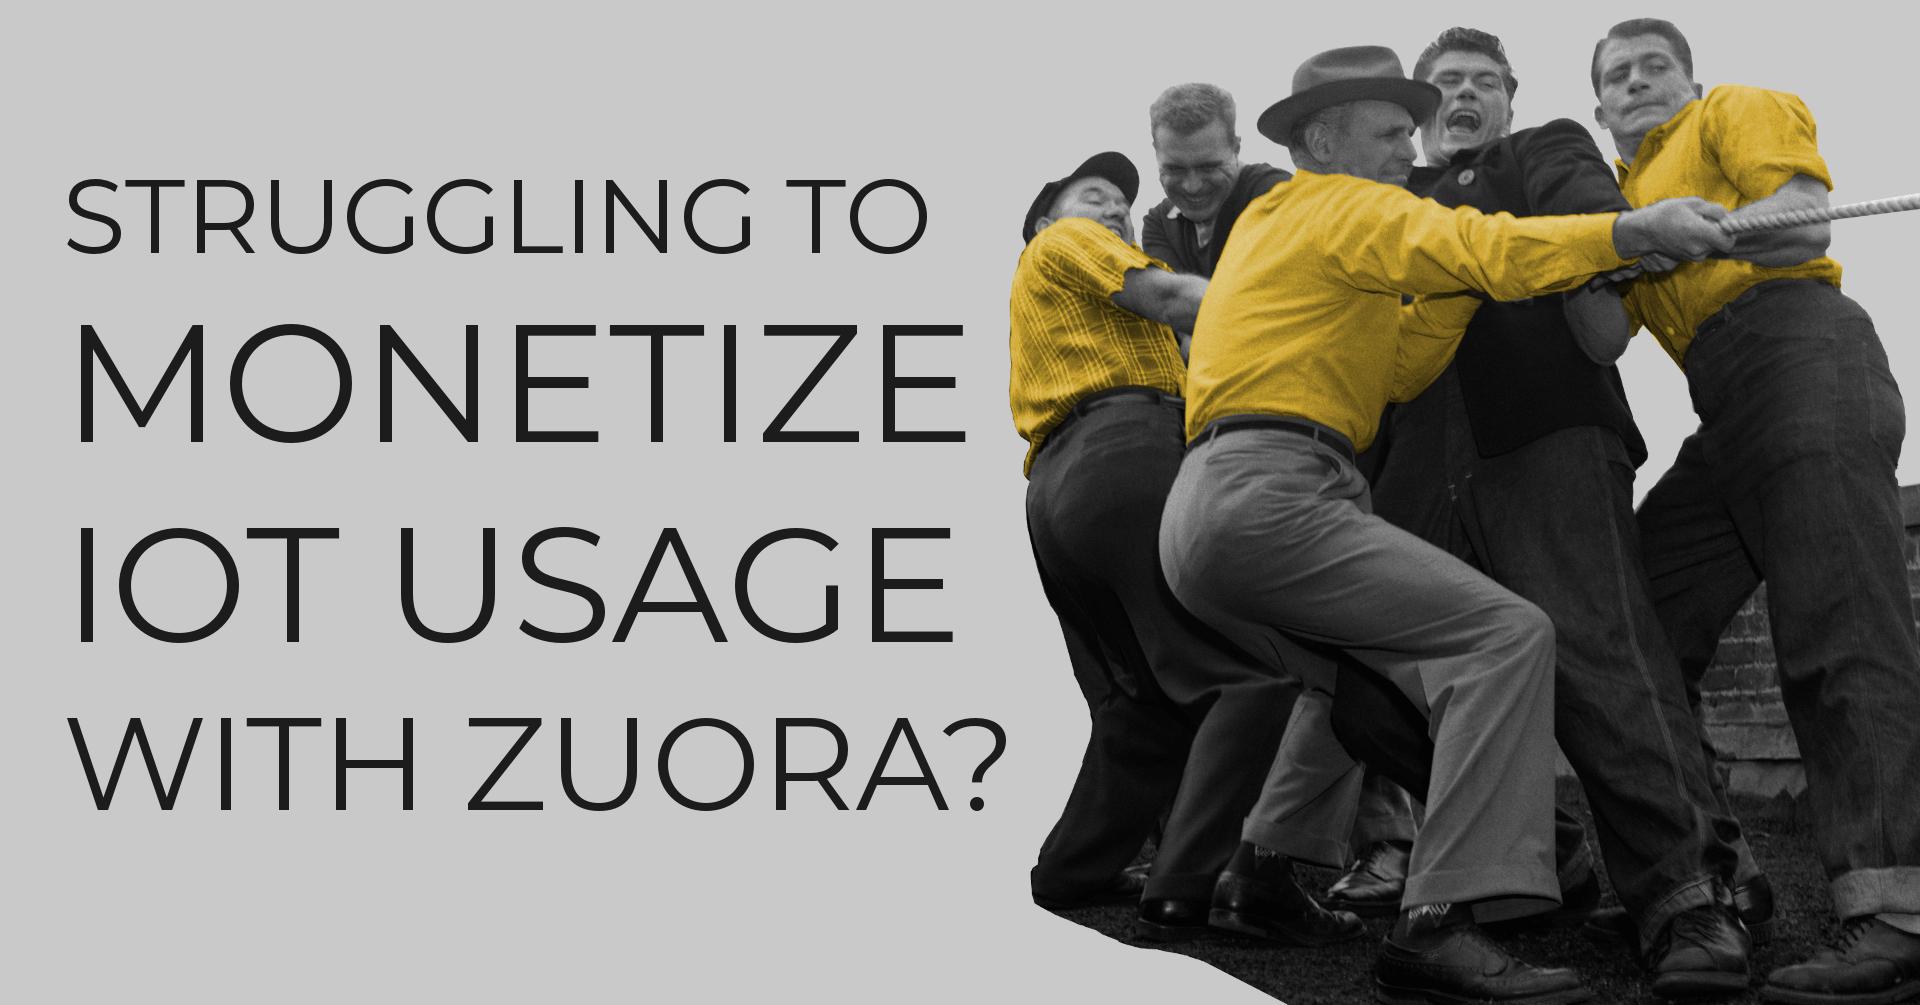 Struggling to Monetize IoT Usage with Zuora?